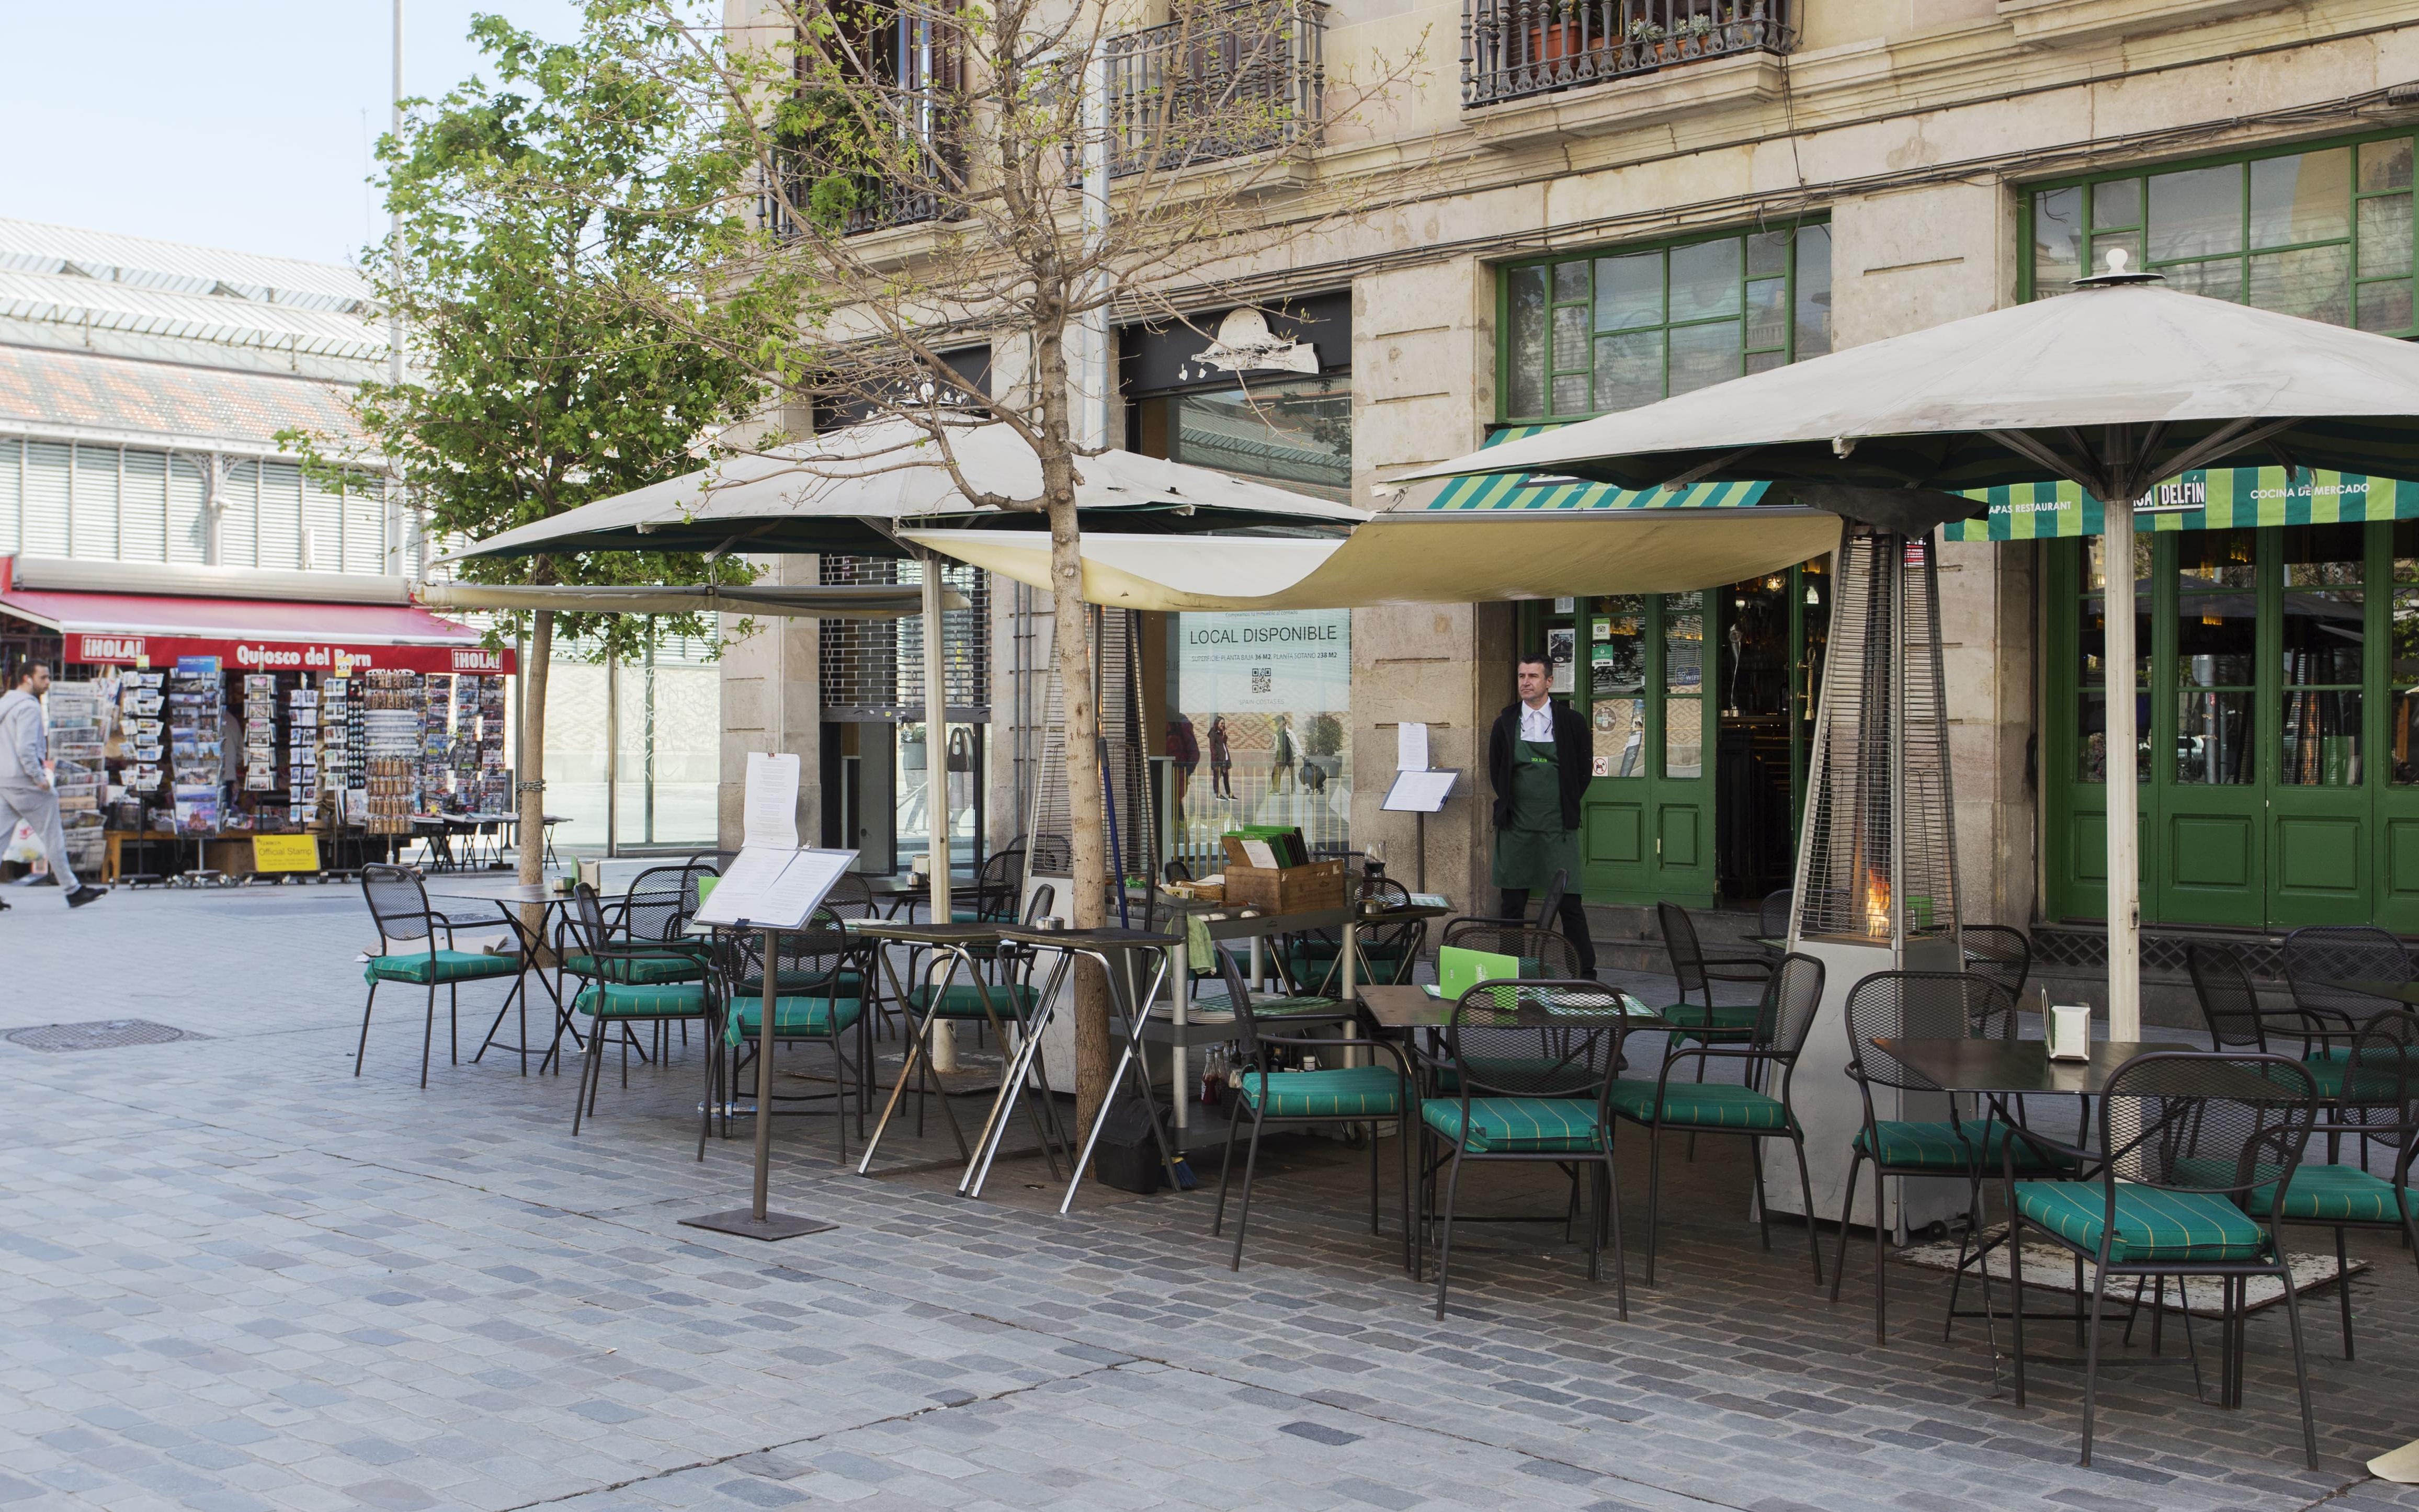 Casa Delfín, gastronomía catalana en un local centenario